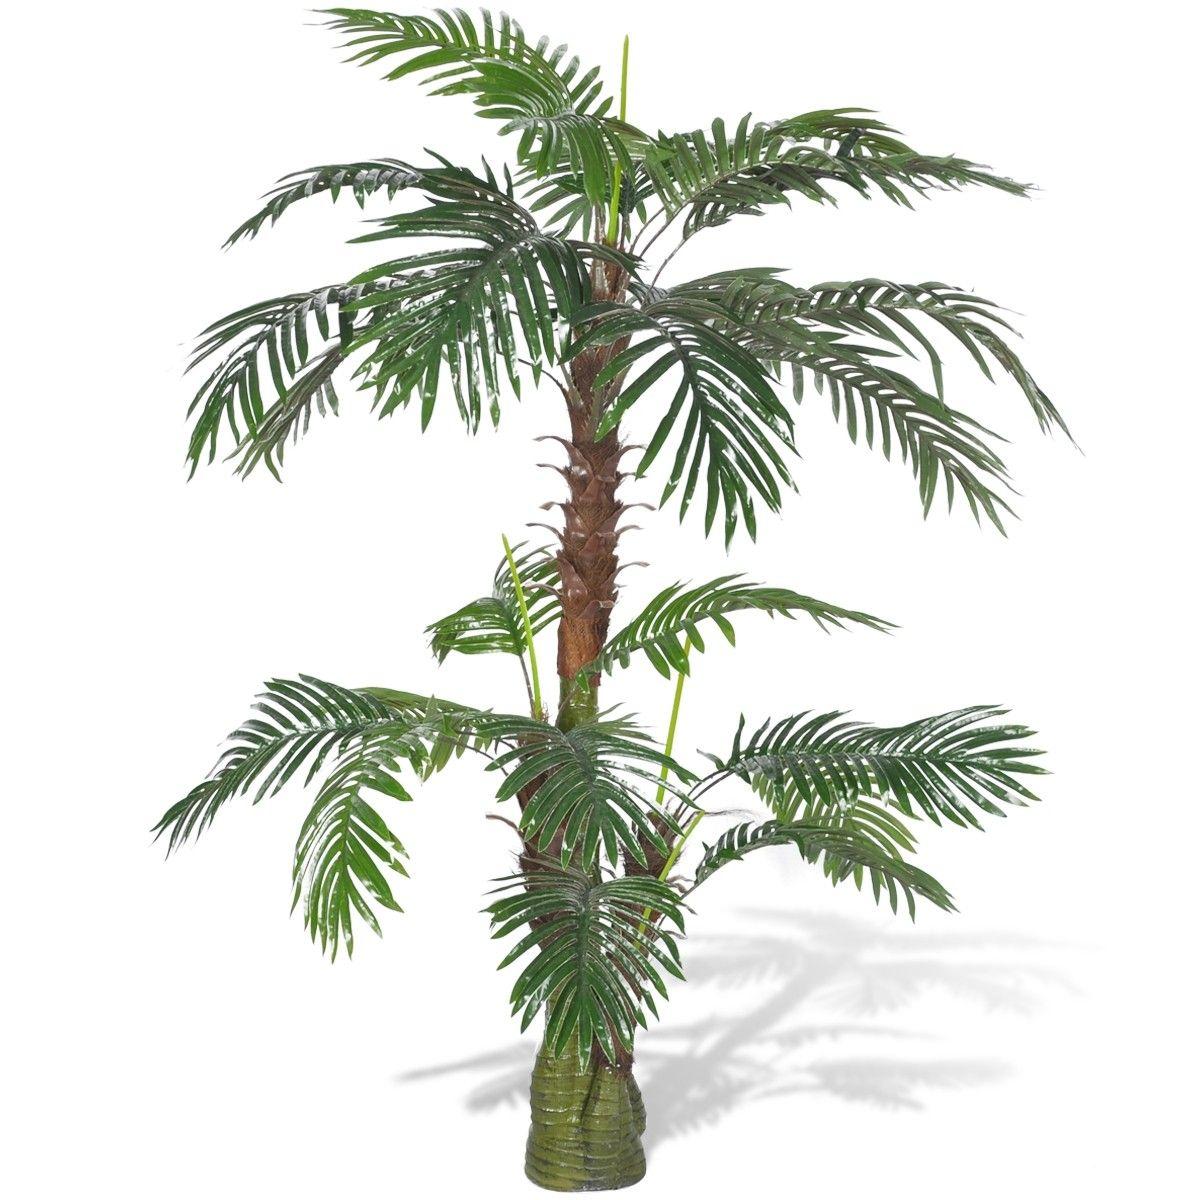 Helt nye Kunstig palmetre 150 cm (241355) | FINN.no NJ-92